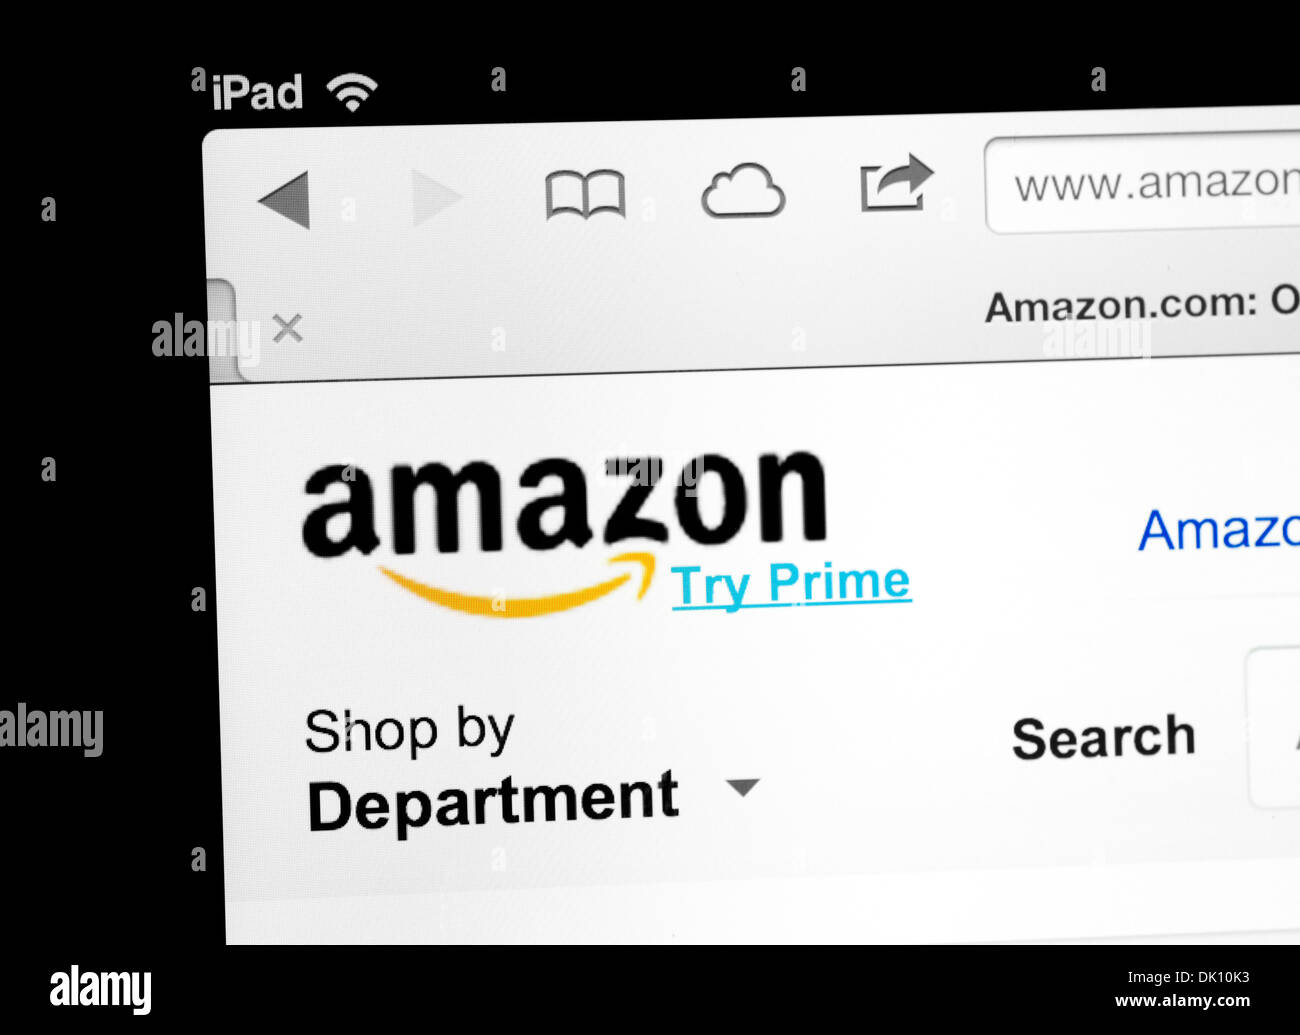 Amazon.com website viewed on an iPad - Stock Image